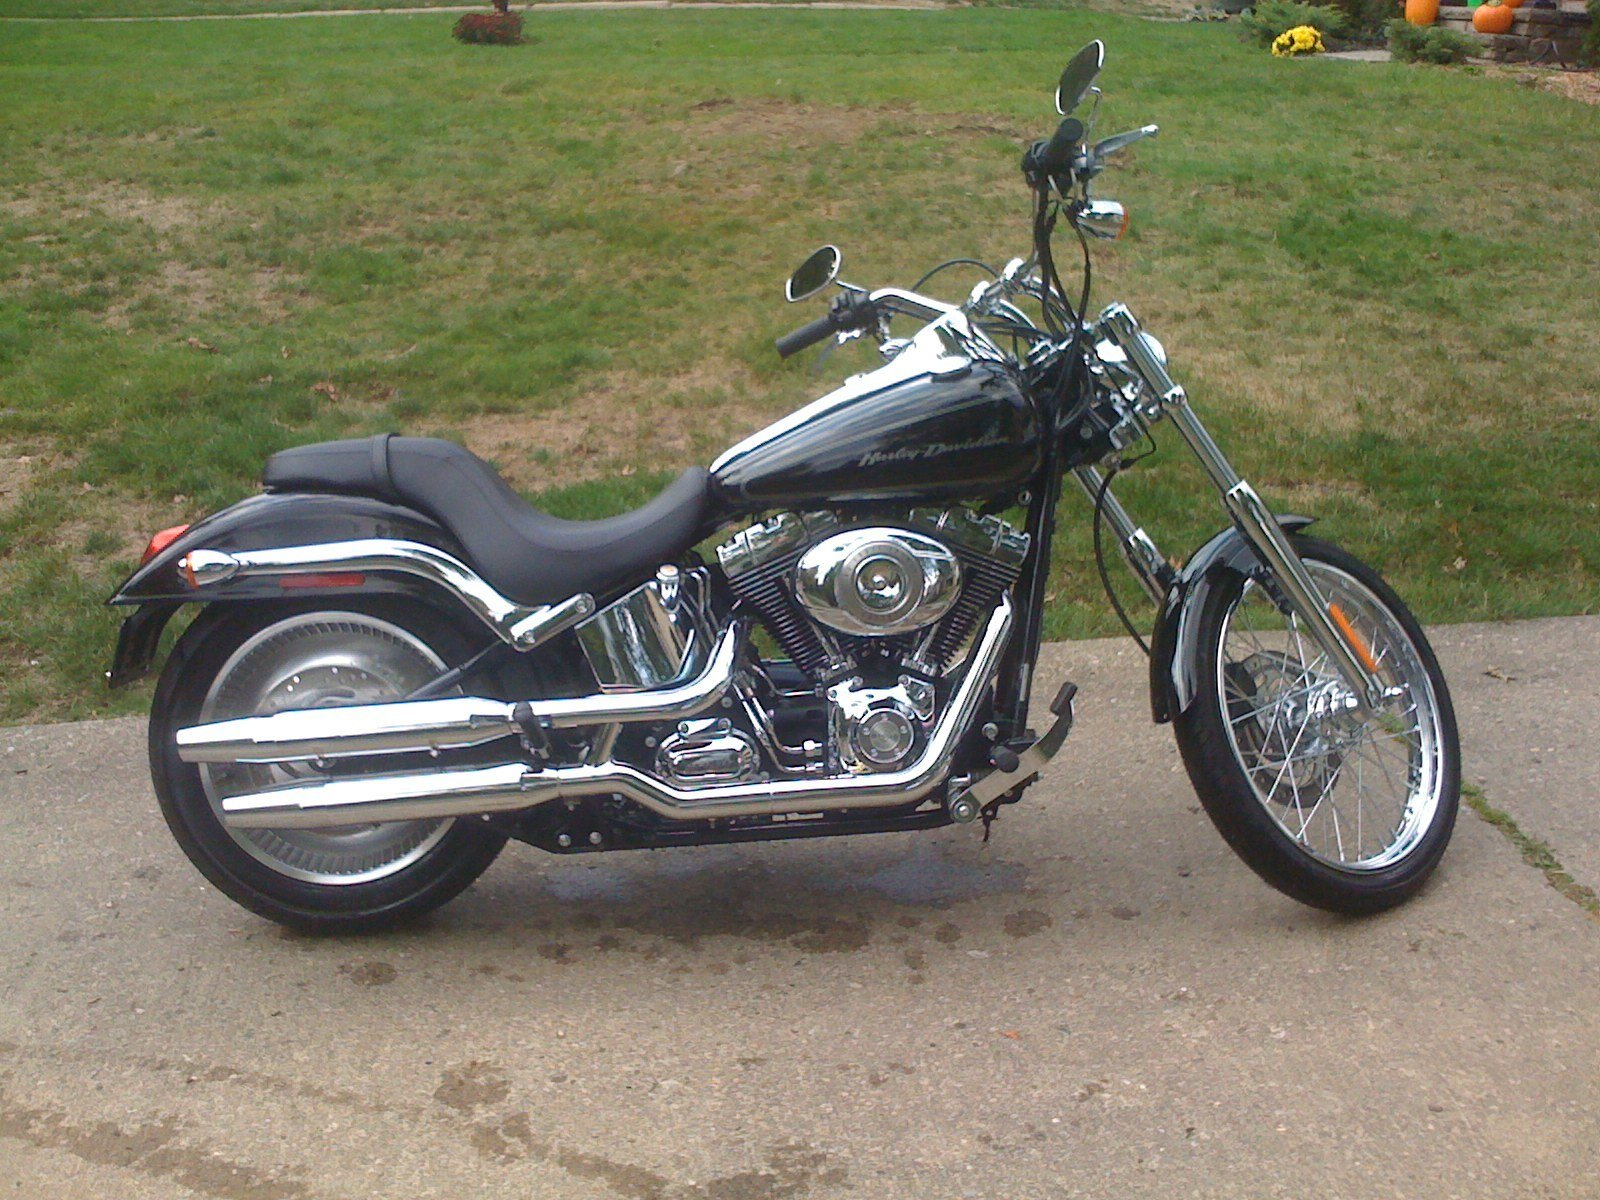 2007 Harley-Davidson Softtail Deuce